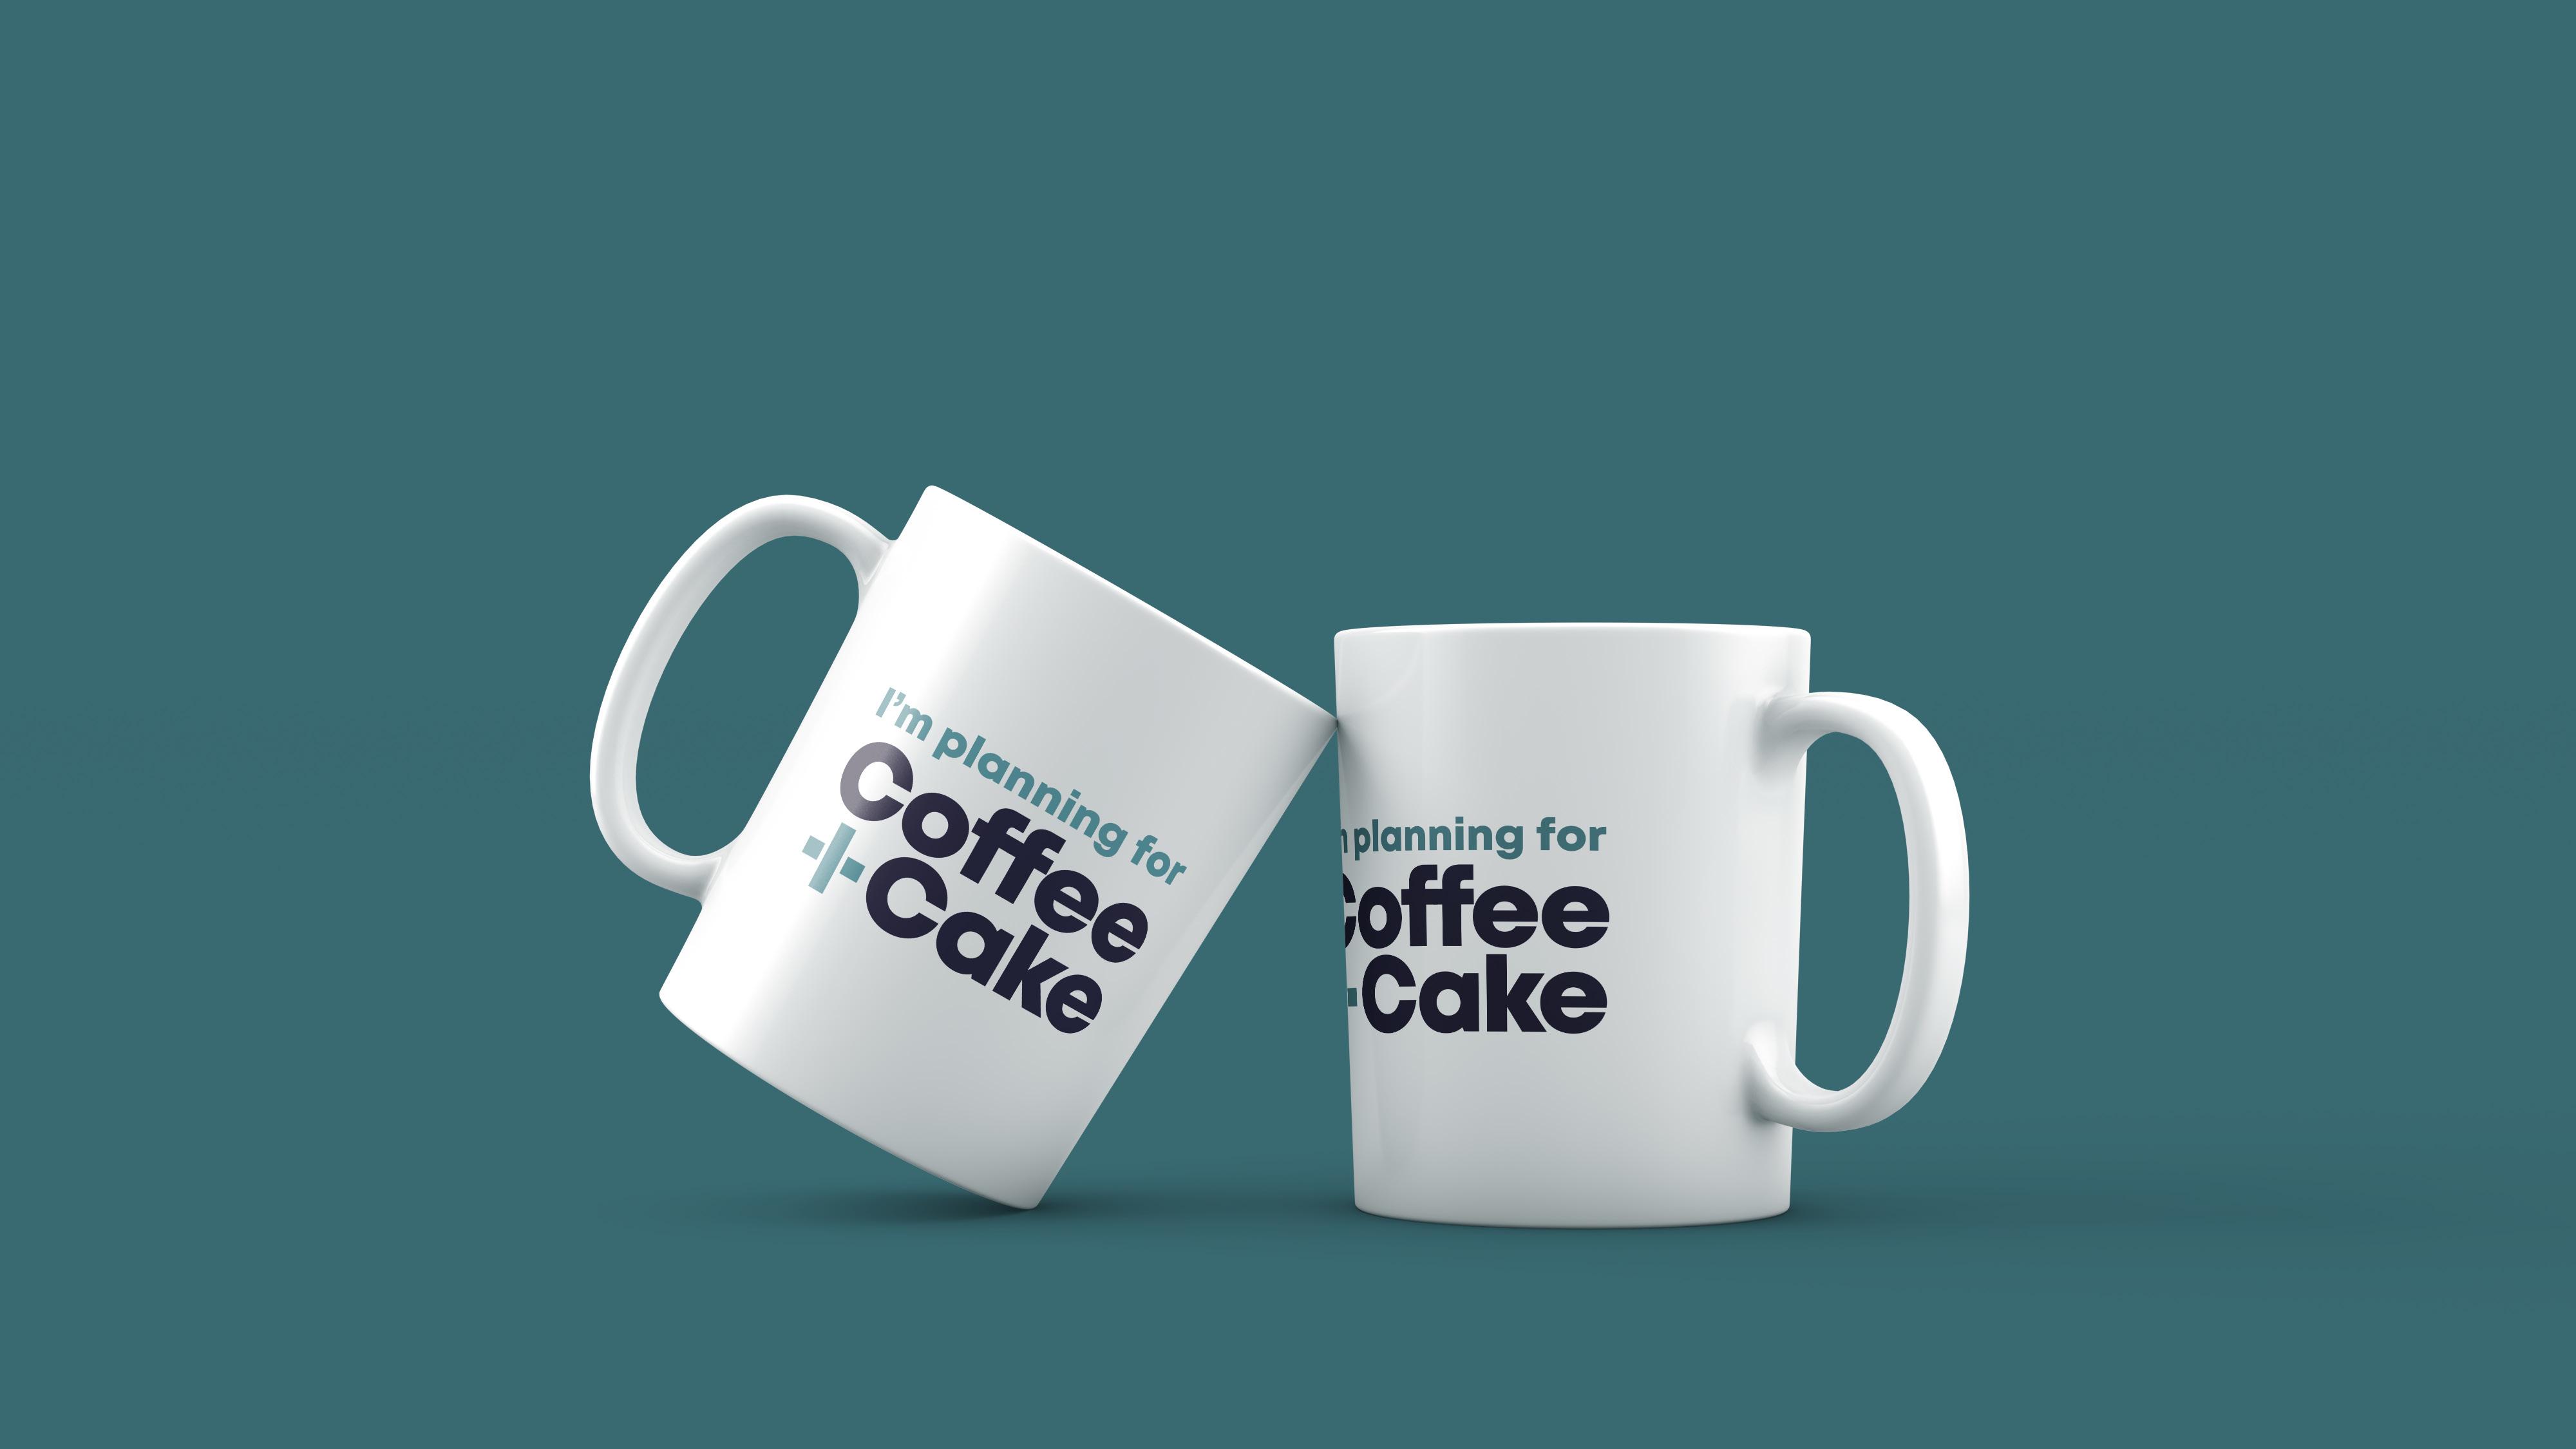 Peacock + Smith branding on coffee mugs